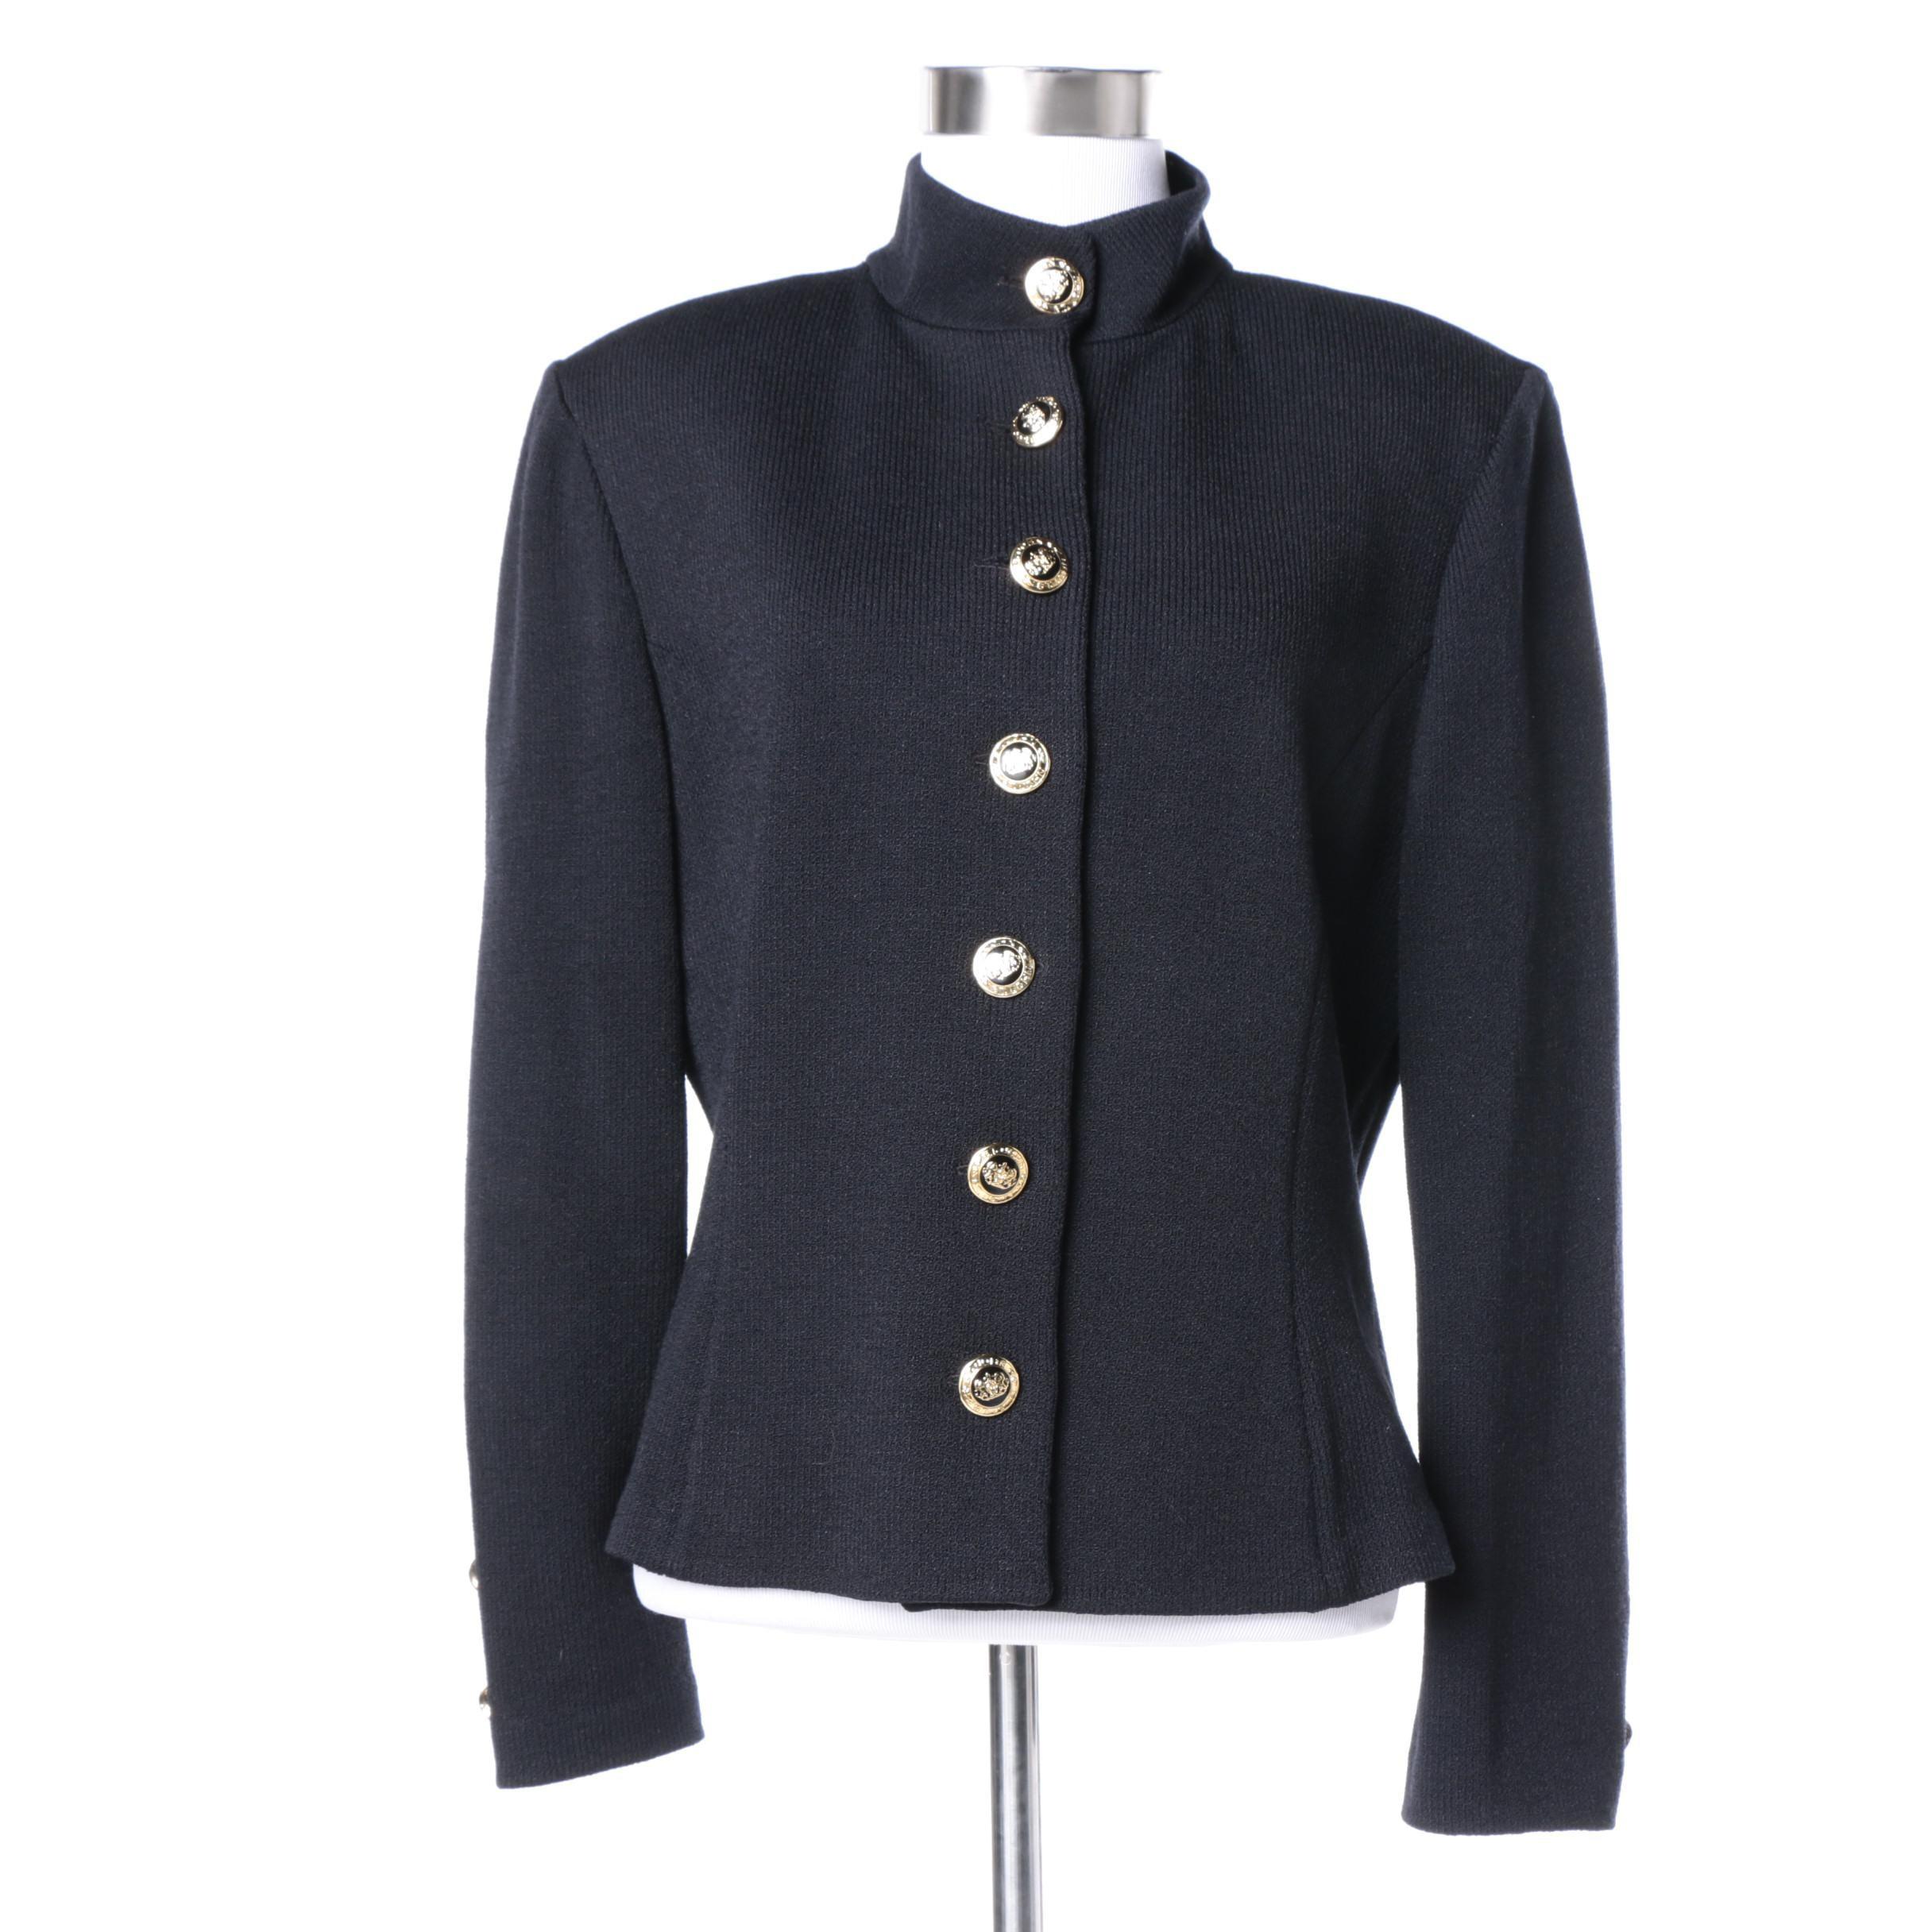 St. John Basics Black Knit Jacket